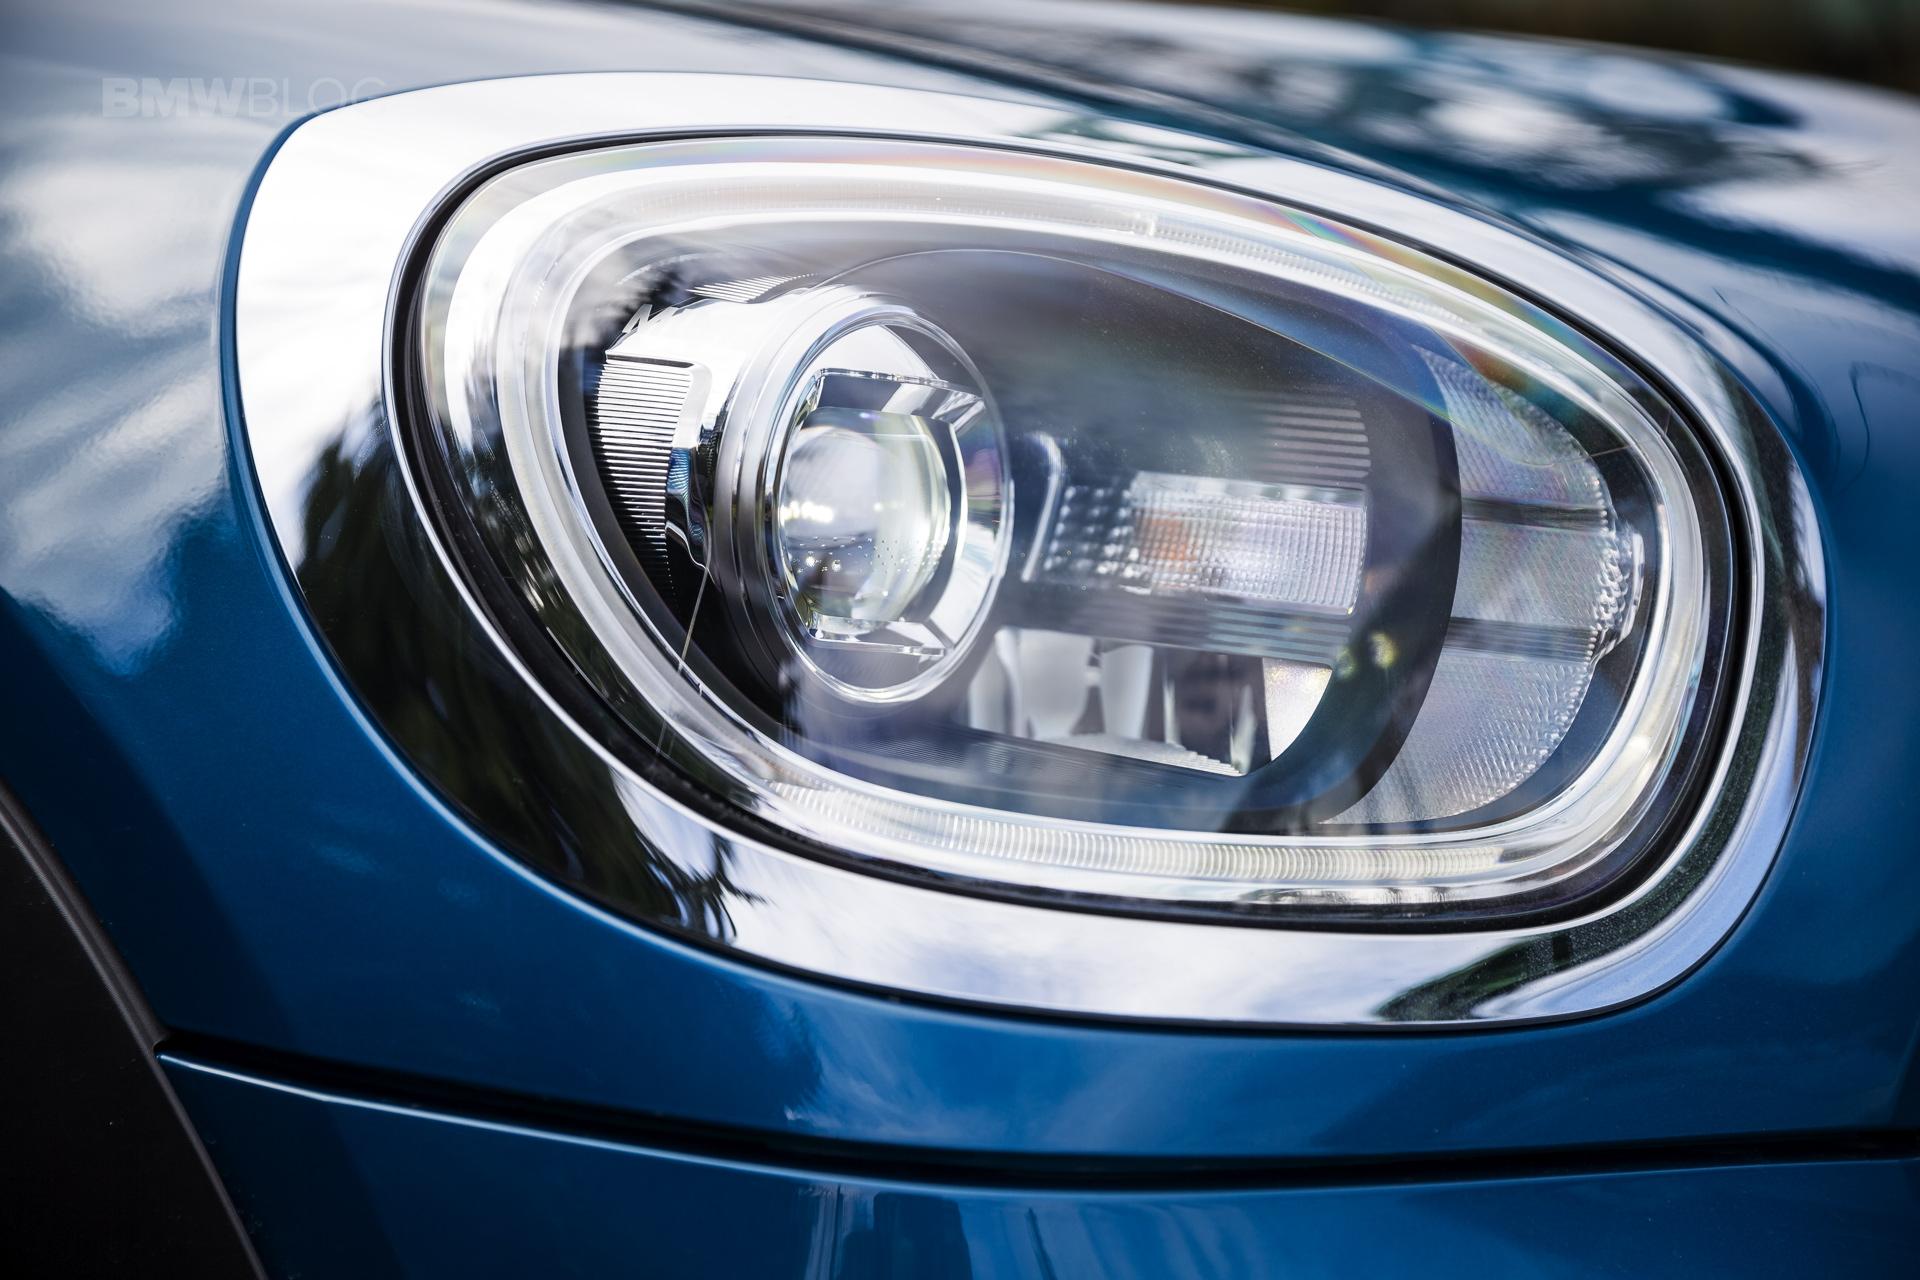 2017 MINI Countryman test drive 38